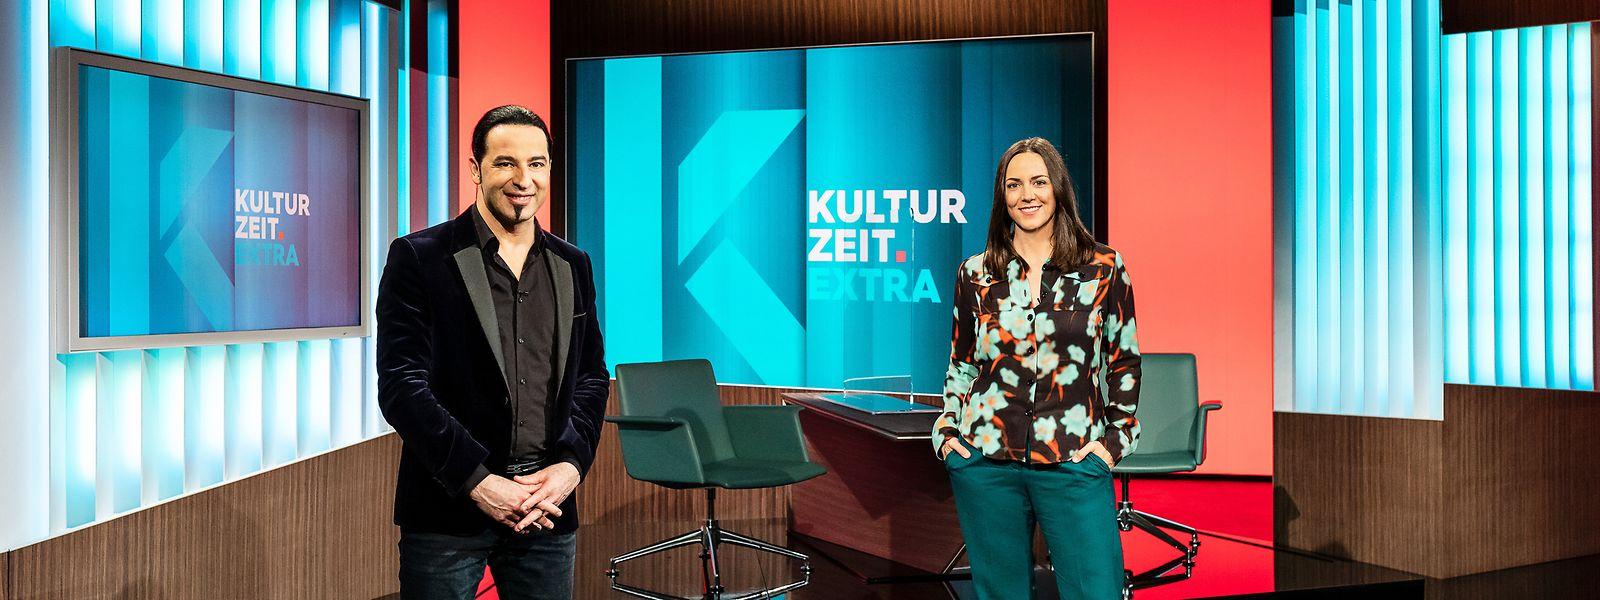 Bülent Ceylan und 3sat-Moderatorin Nina Brunner.